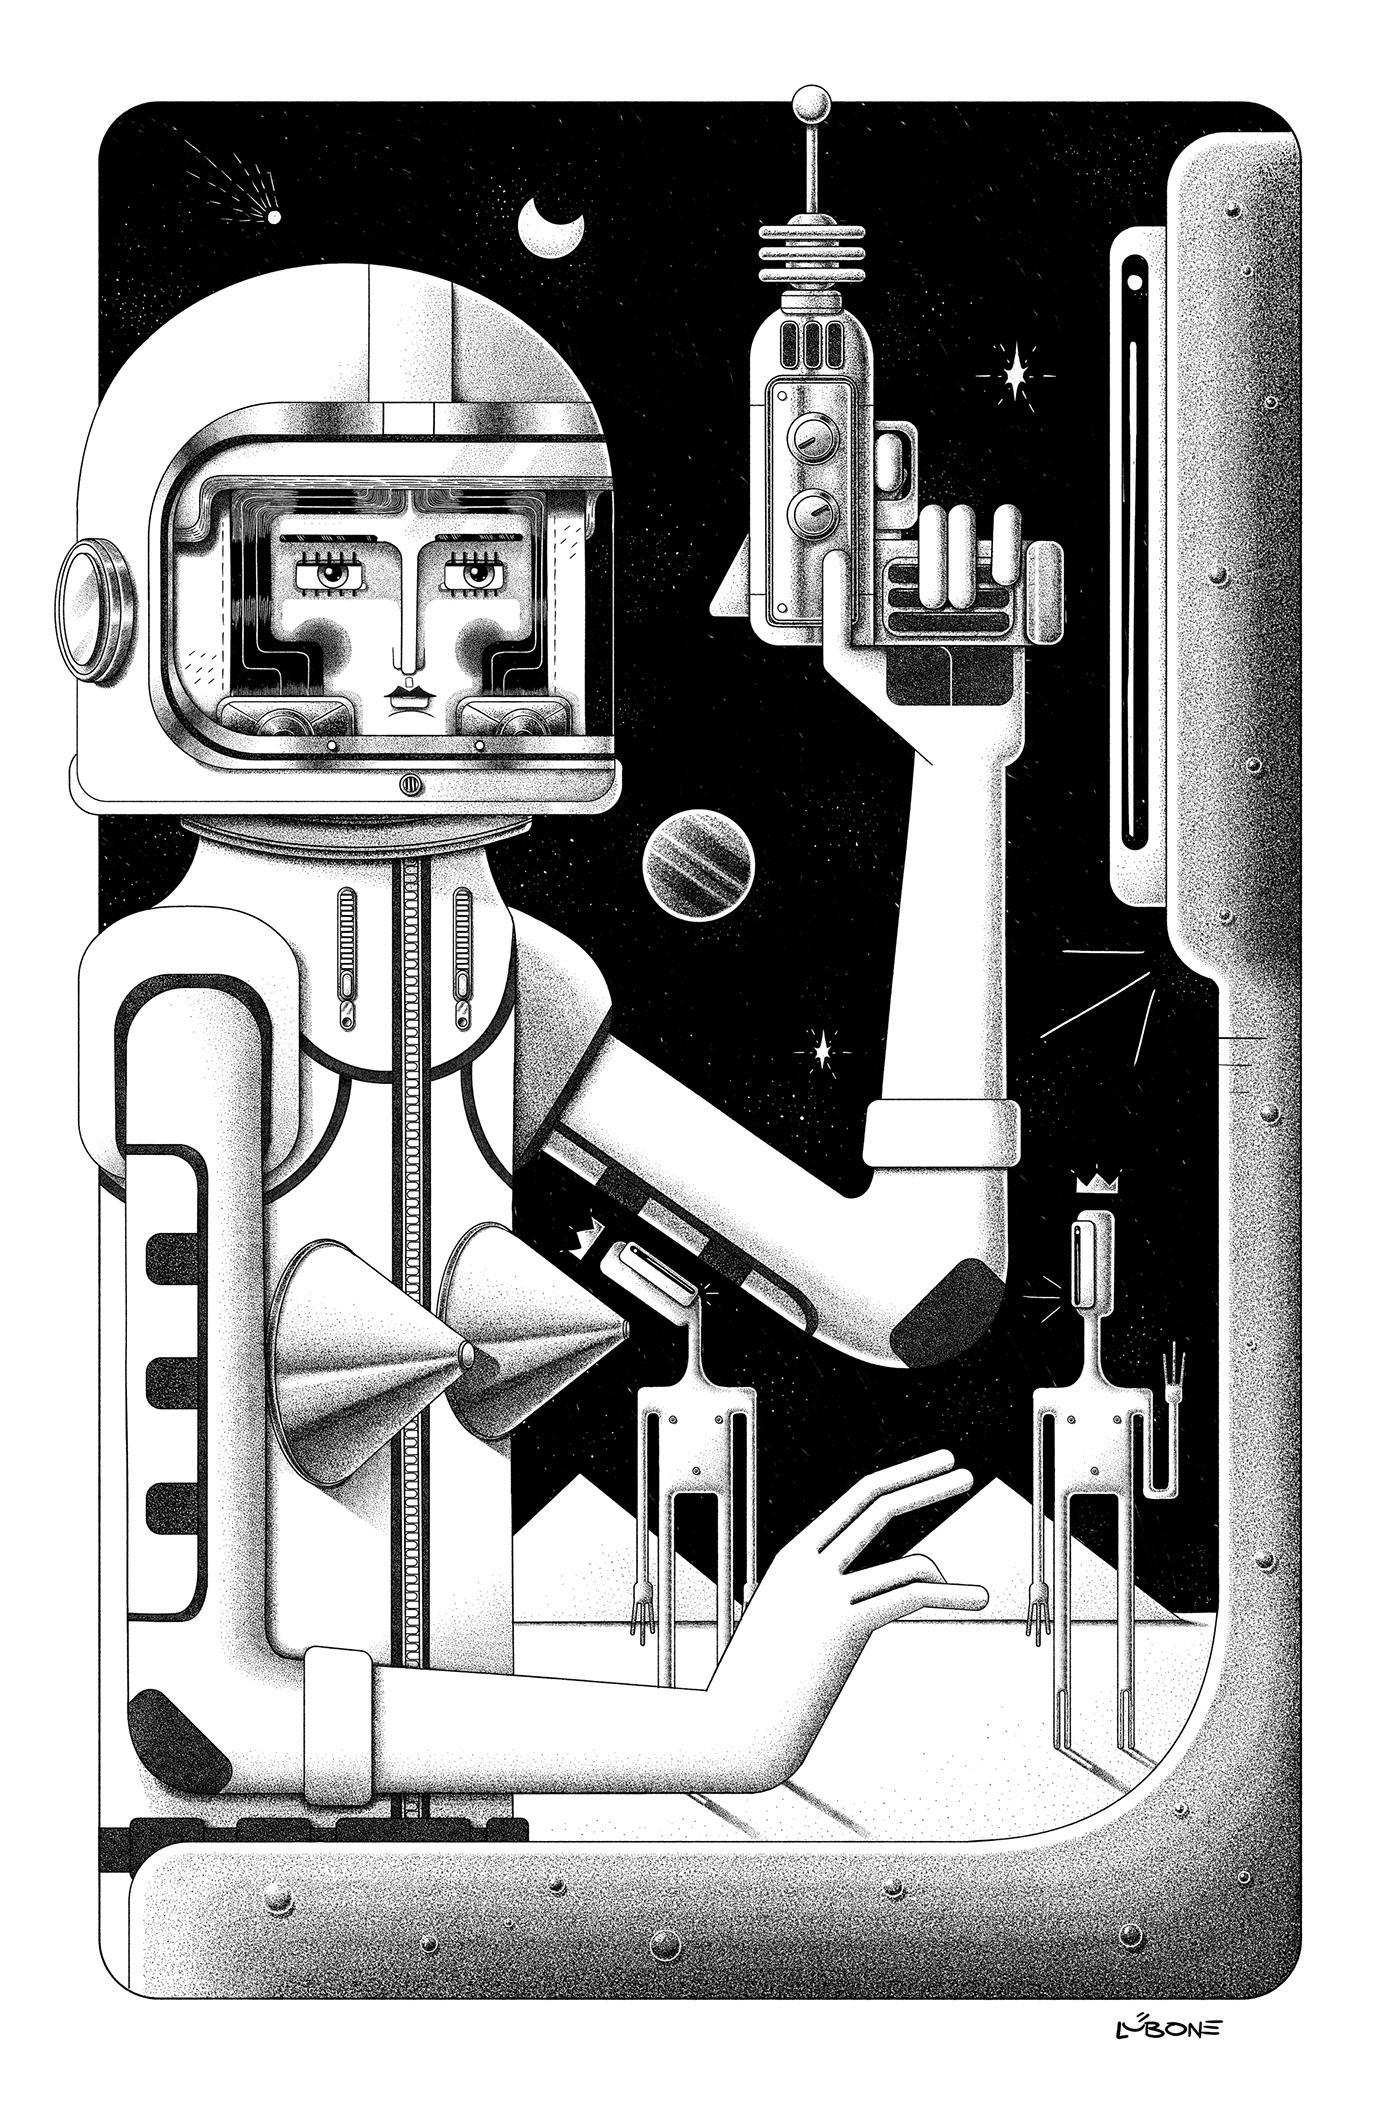 Lub One Иллюстрация, Цифровое искусство, Дизайн персонажей (8).jpg